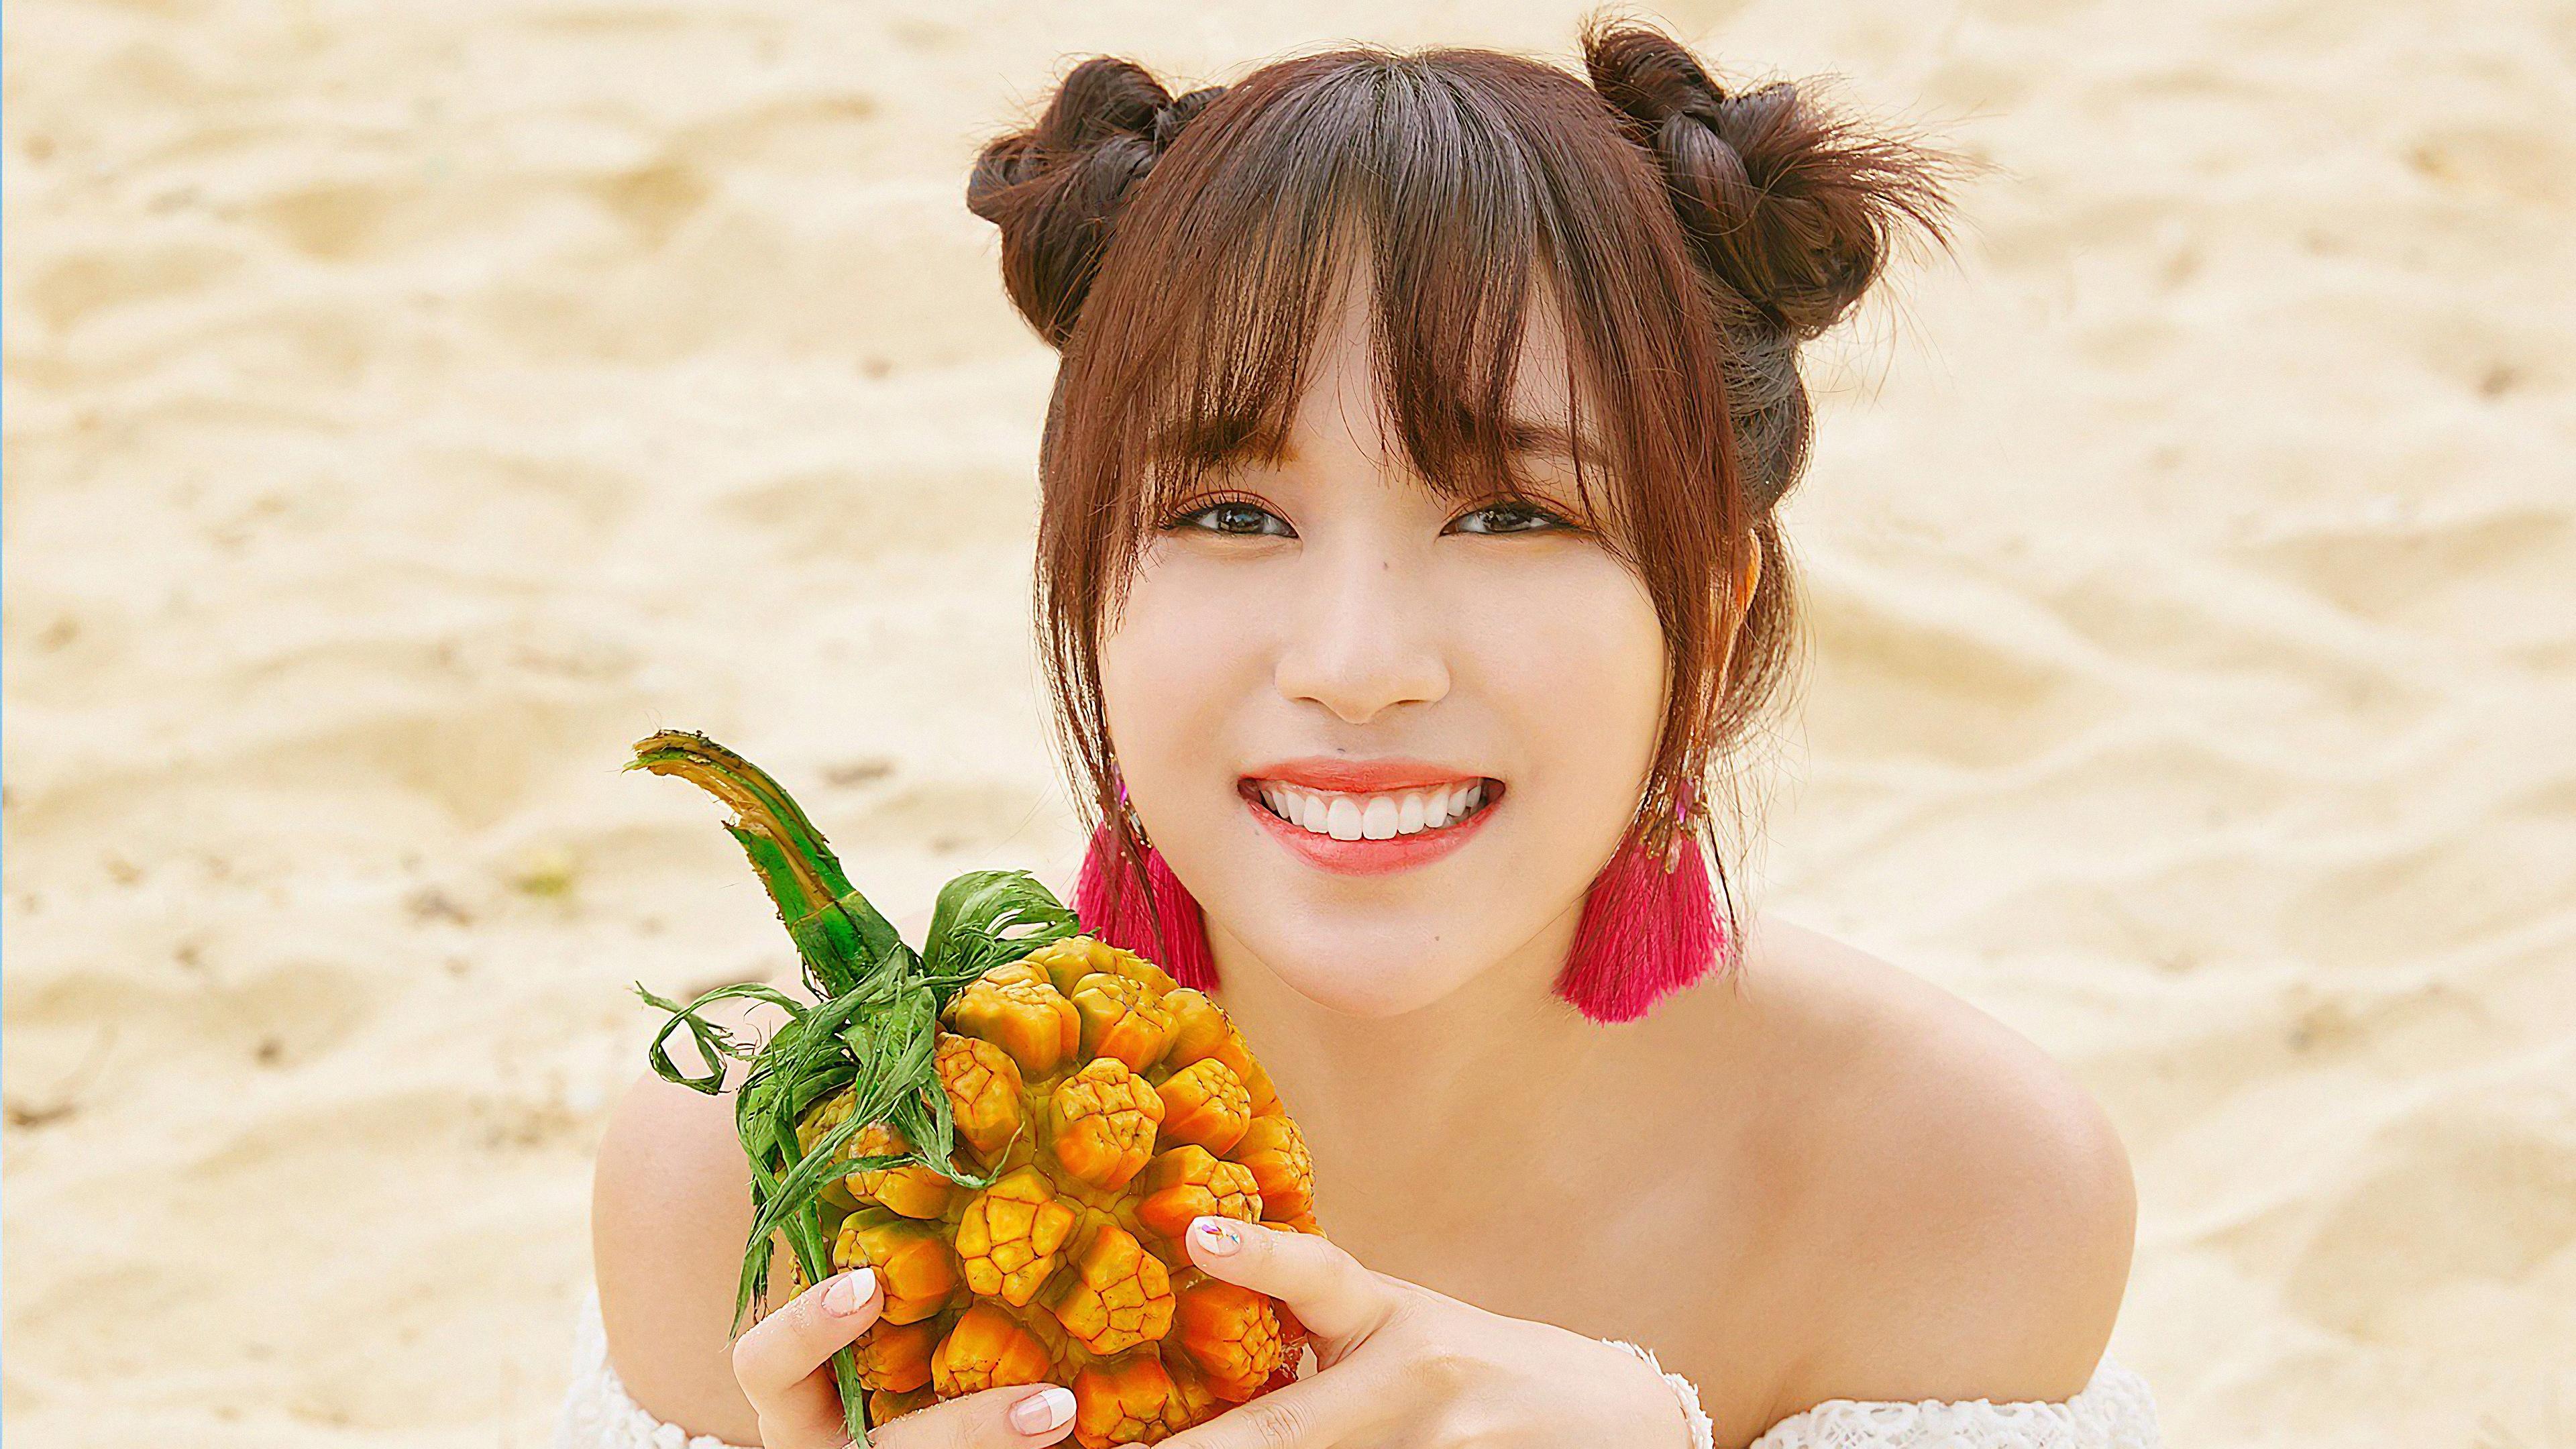 Background Hd Wallpaper Girl Mina Twice Summer Nights 4k 17345